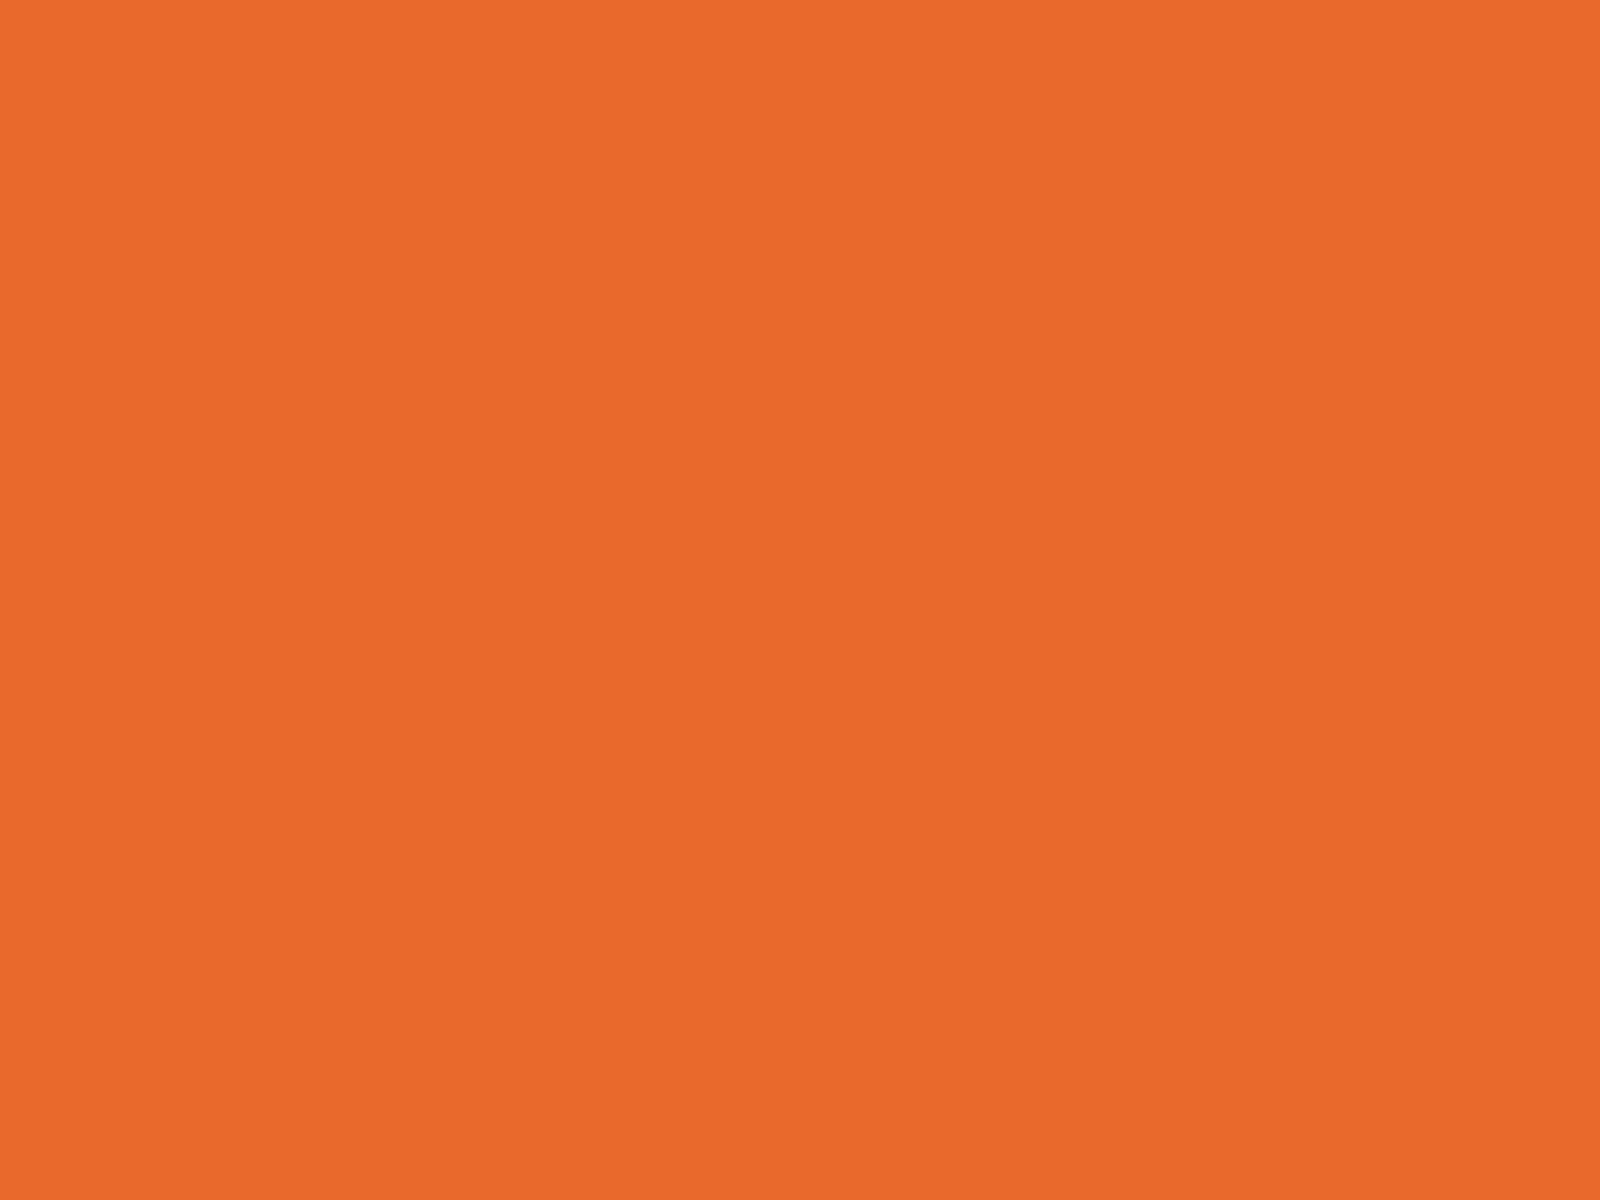 1600x1200 Deep Carrot Orange Solid Color Background